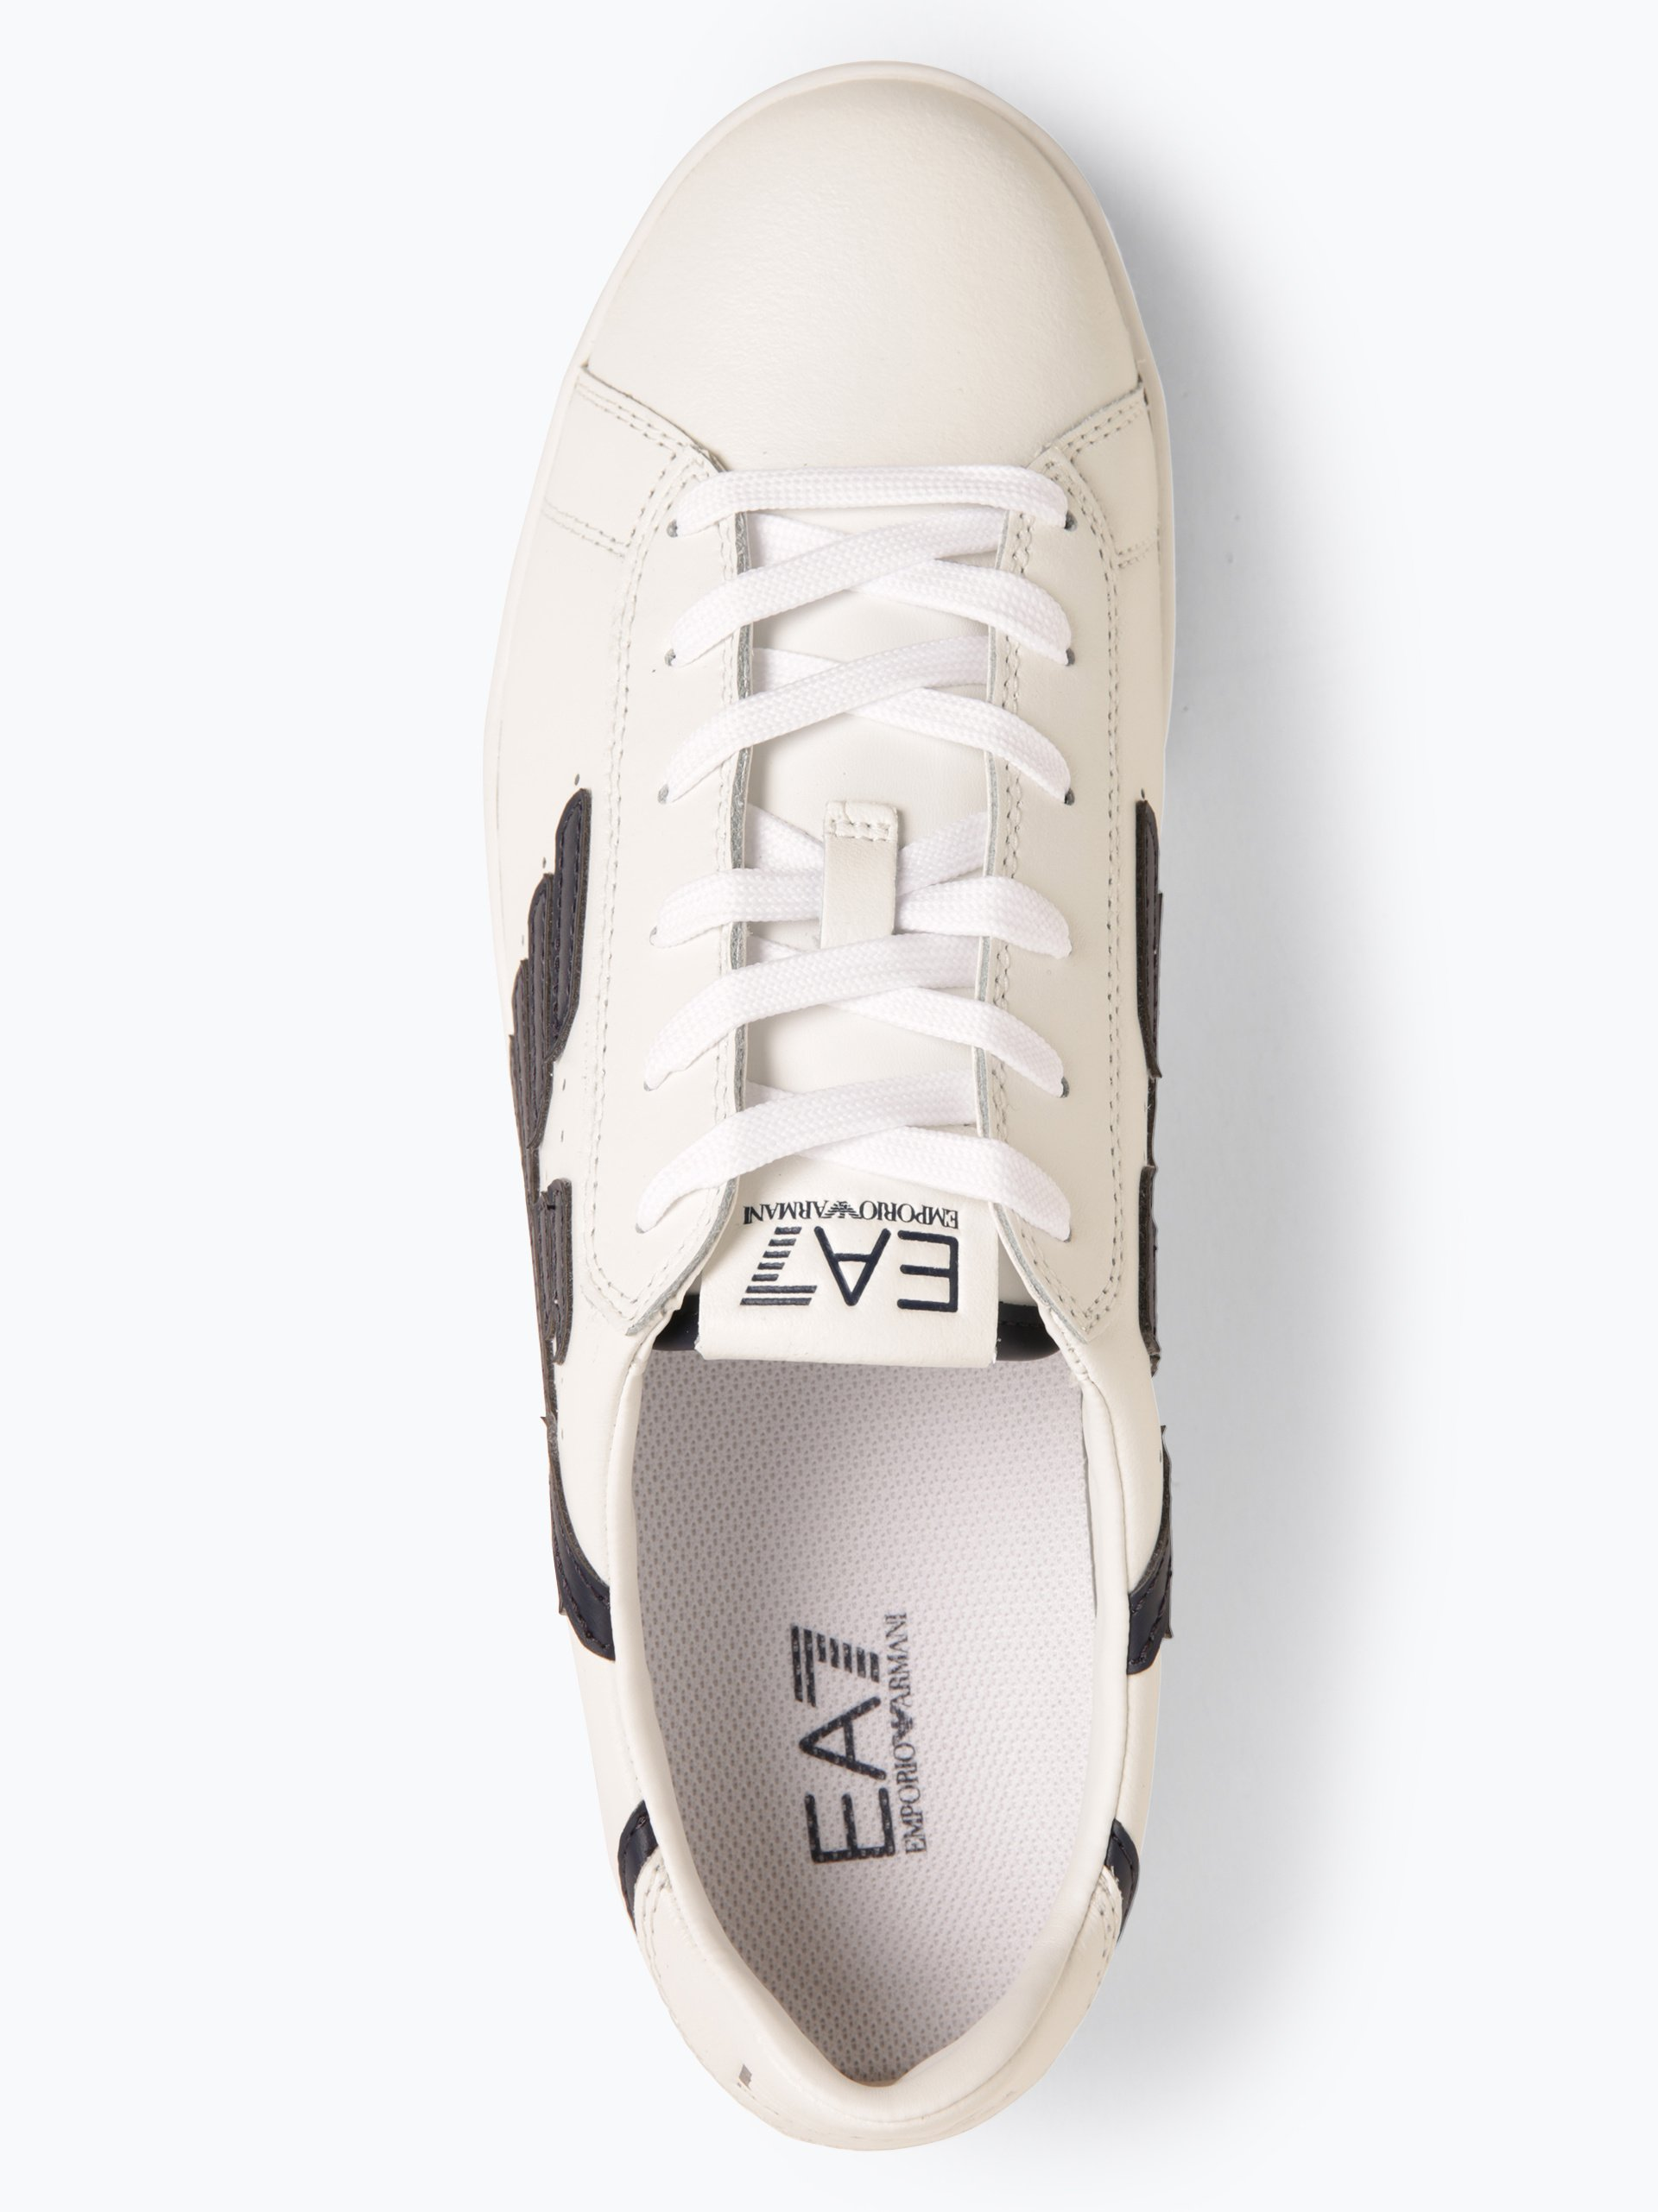 EA7 Emporio Armani Tenisówki męskie z dodatkiem skóry